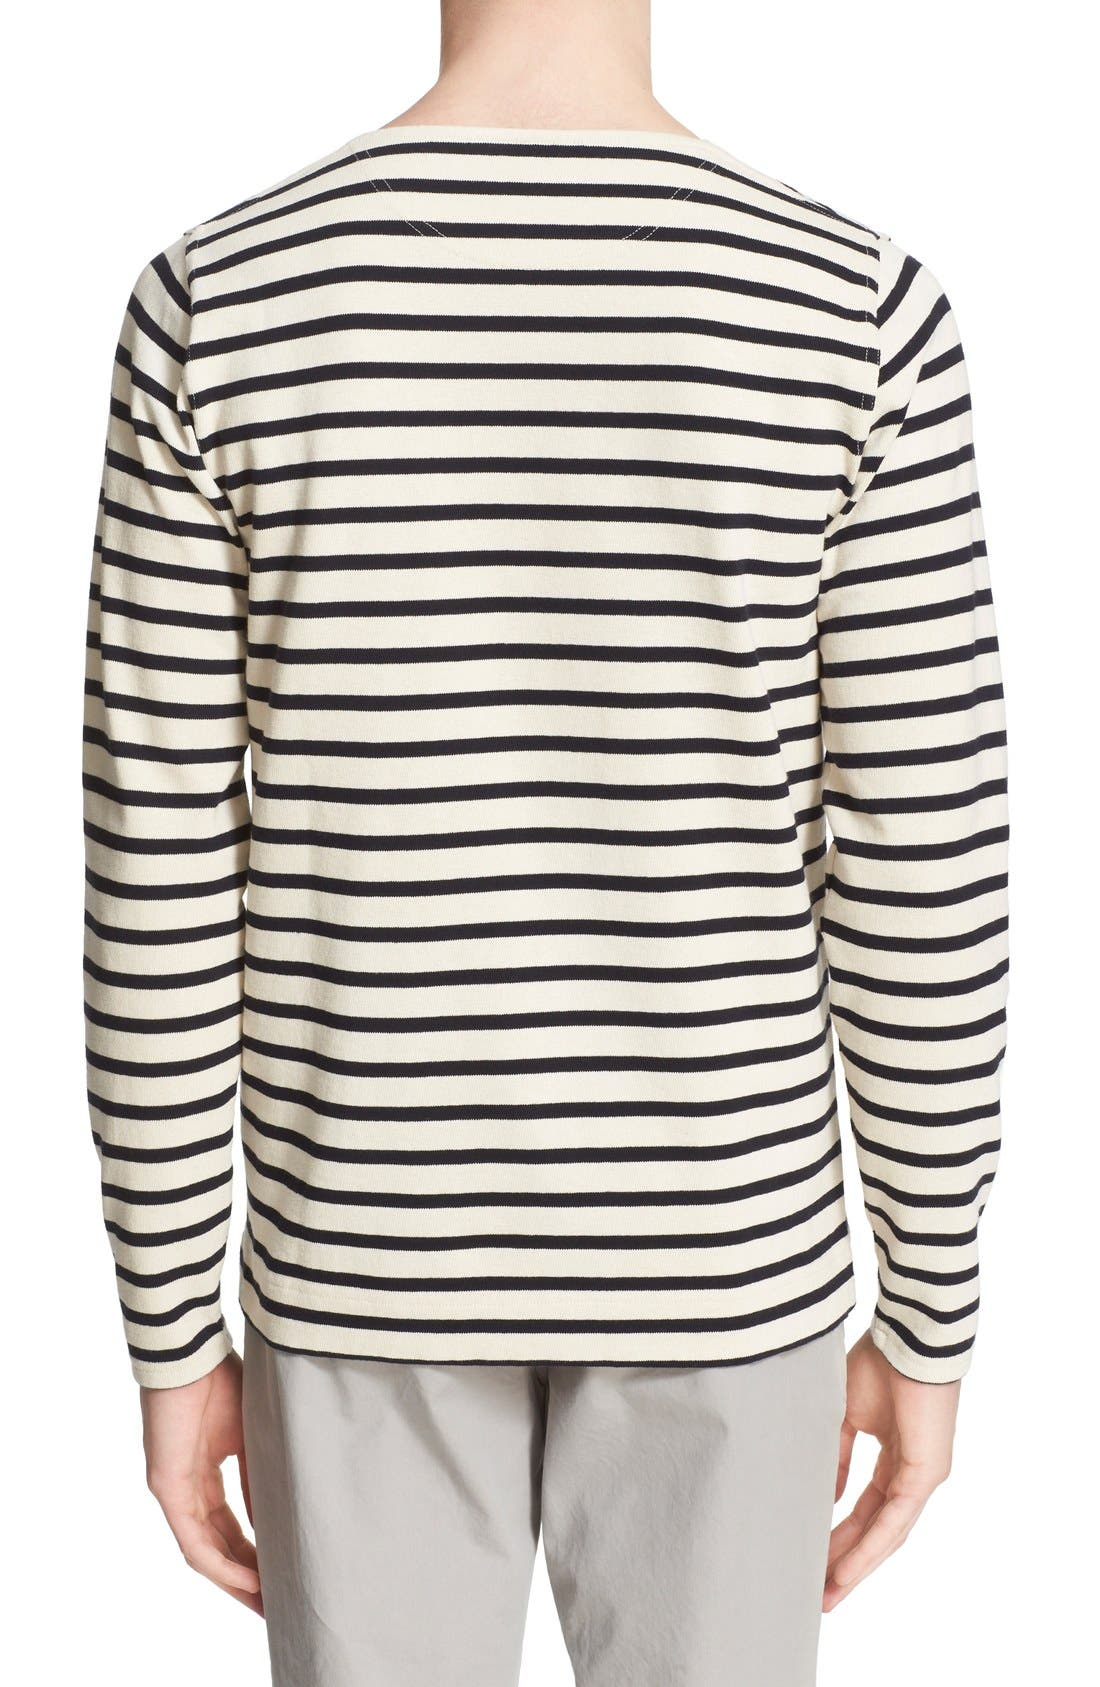 'Godtfred' Stripe Long Sleeve T-Shirt,                             Alternate thumbnail 2, color,                             Ecru Navy